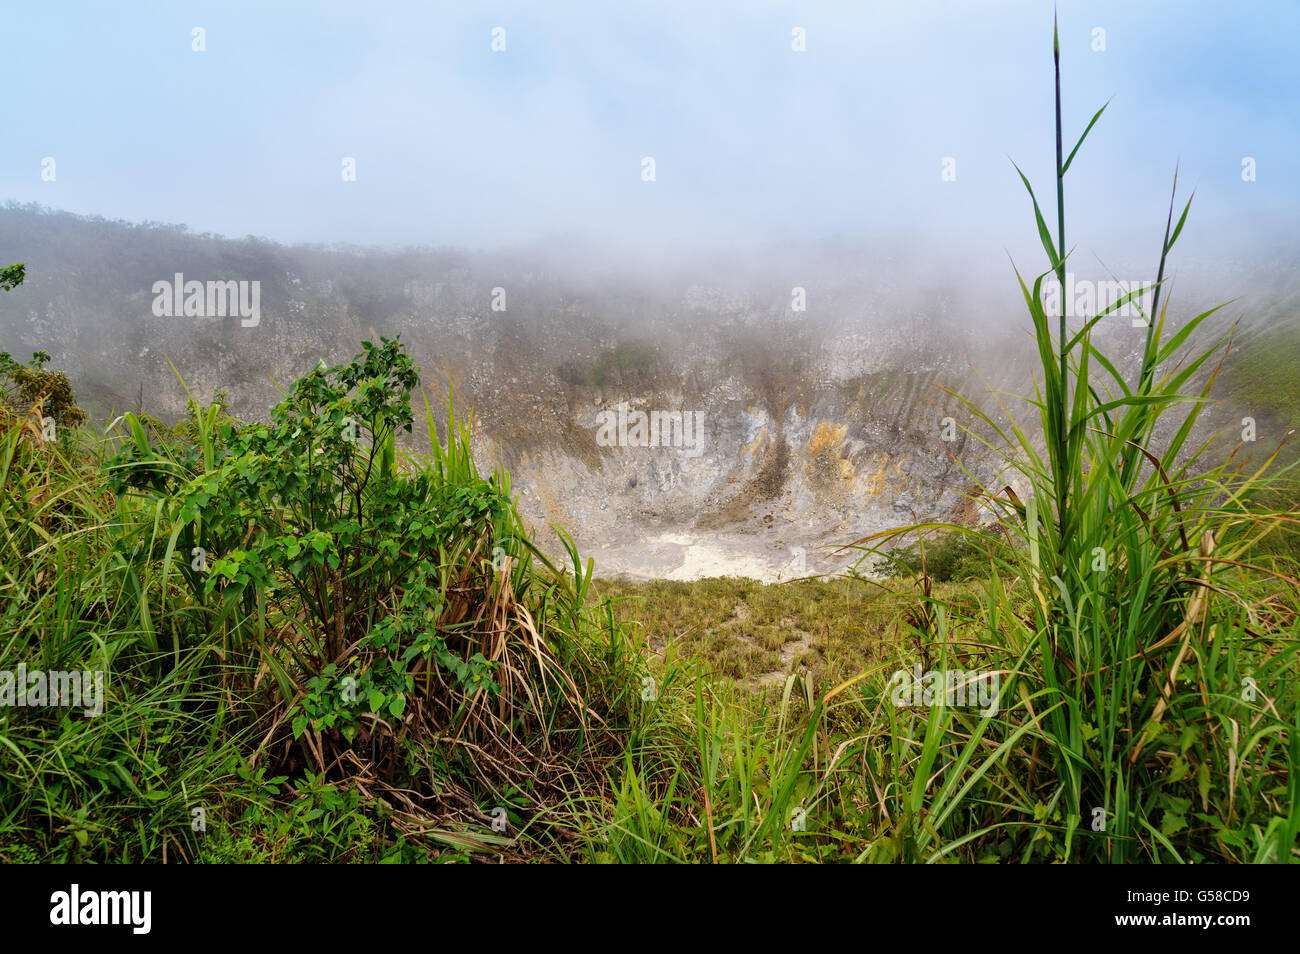 Crater of Volcano Mahawu near Tomohon. North Sulawesi. Indonesia - Stock Image